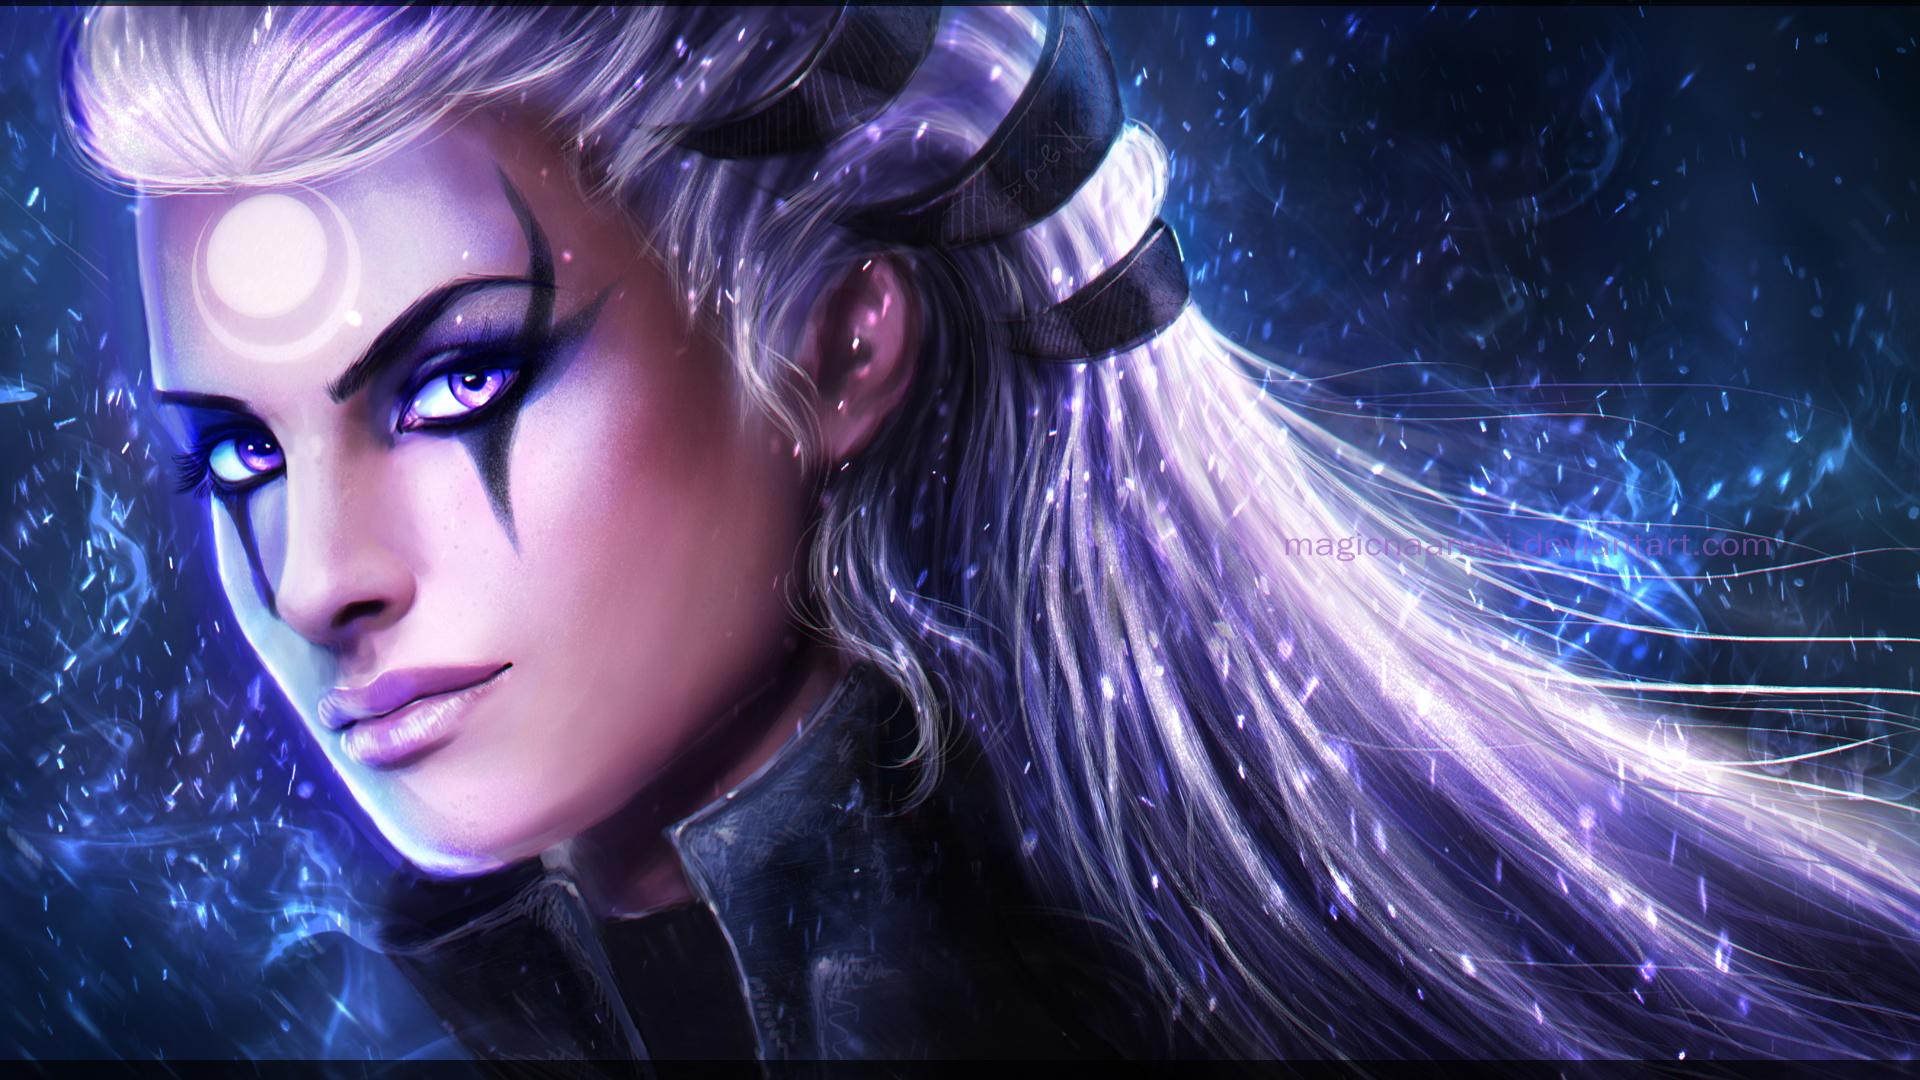 Diana League Of Legends By Magicnaanavi On Deviantart